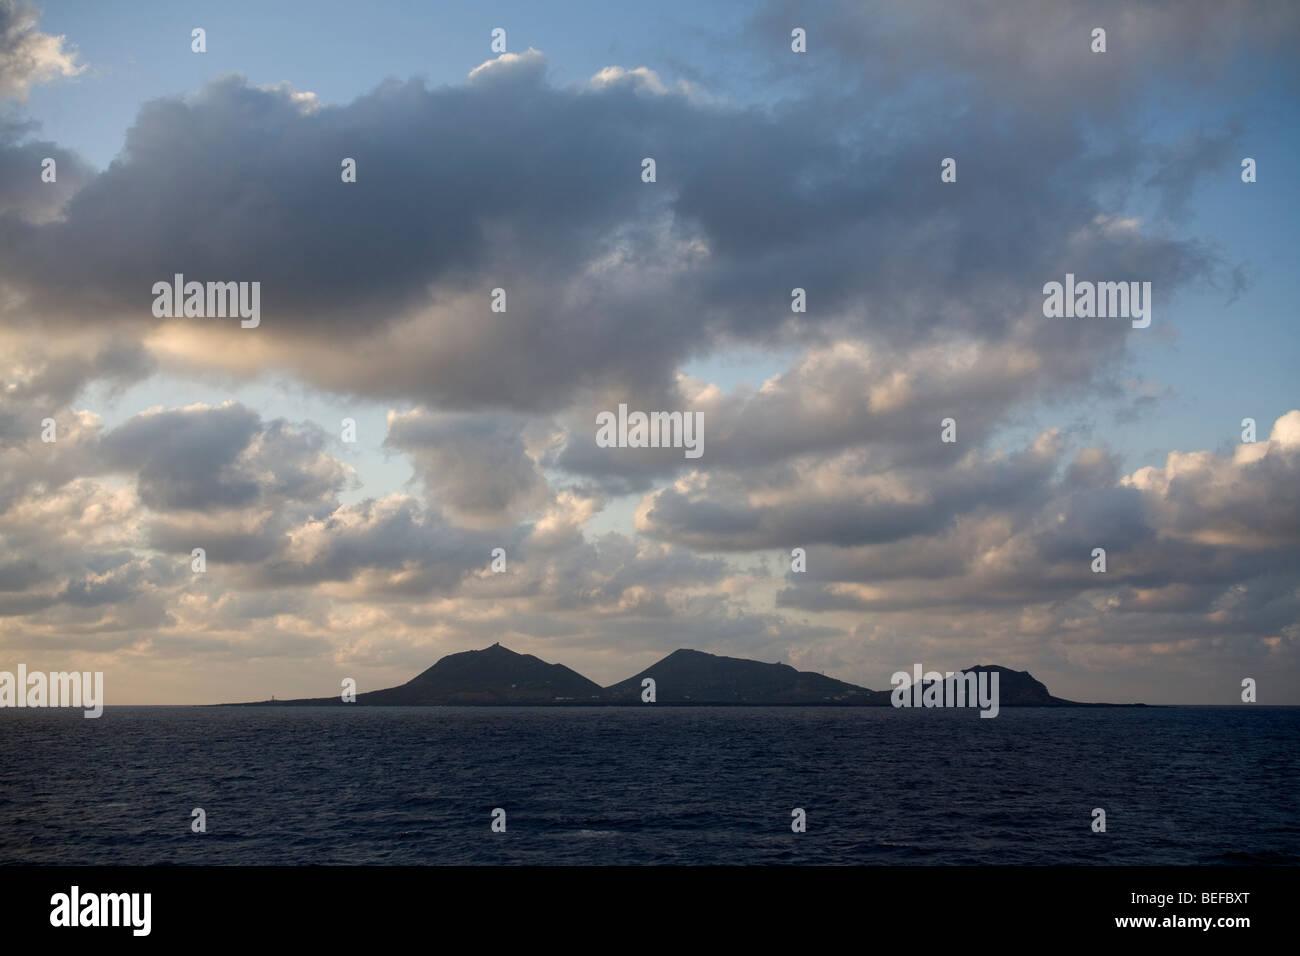 Linosa île sur la mer Méditerranée Photo Stock